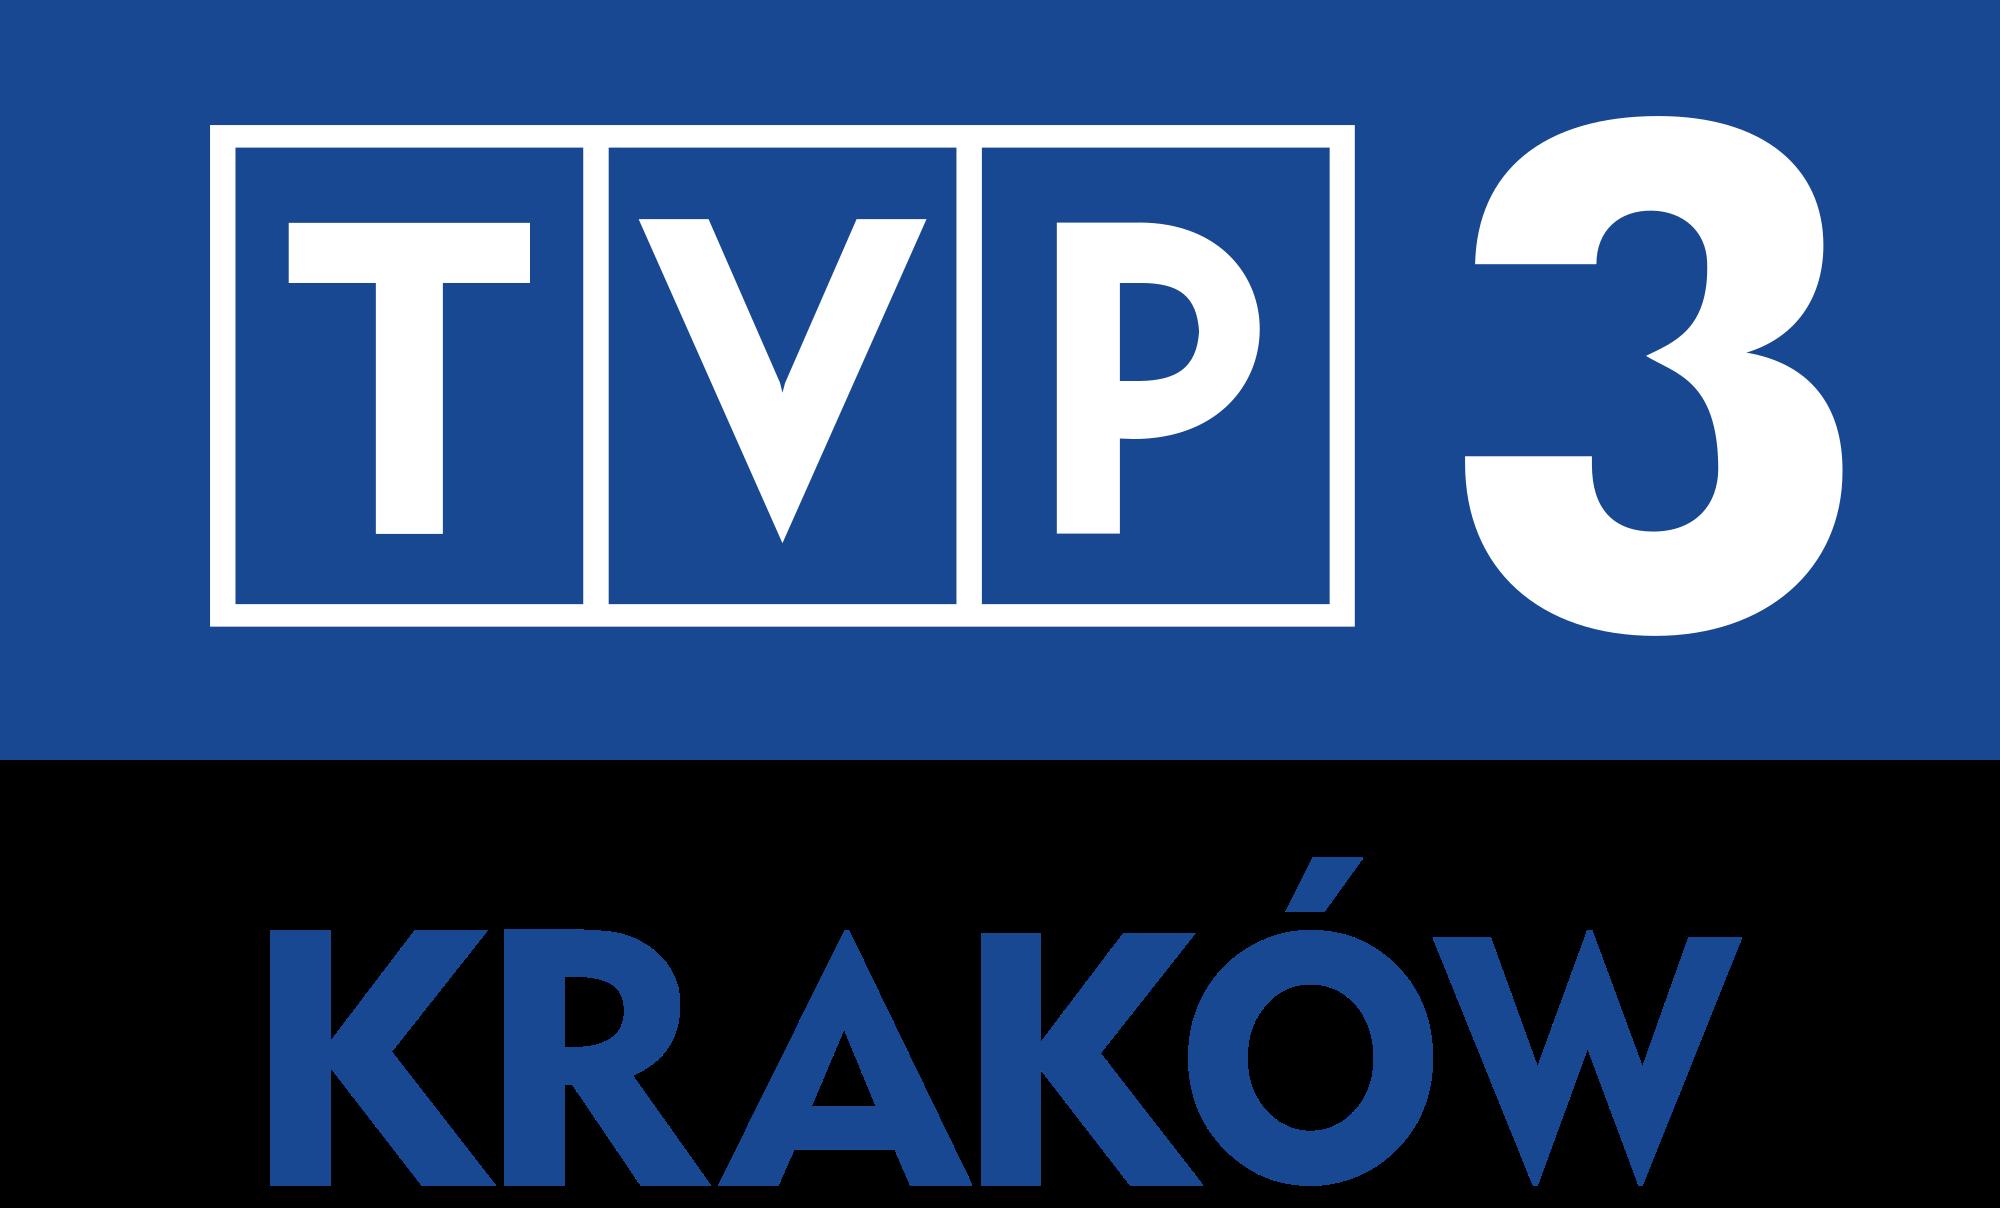 tvp3-krak-w-svg.png